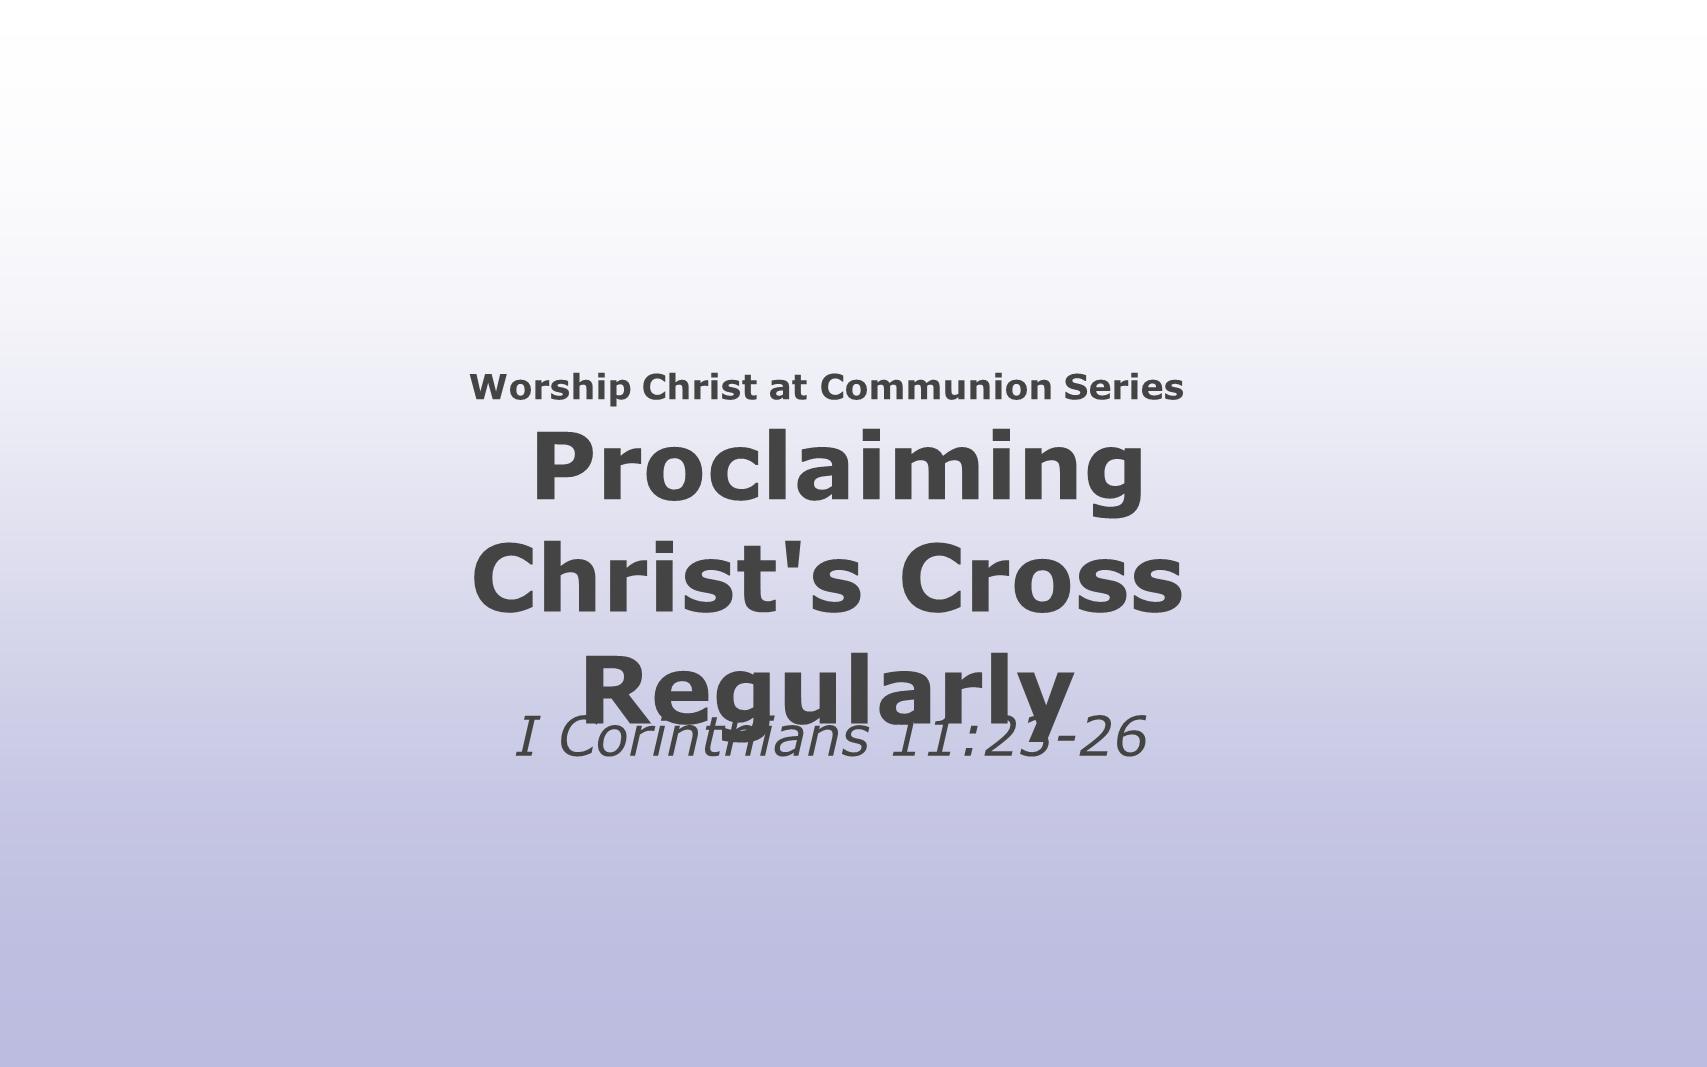 WCC-03 - Proclaiming Christ's Cross Regularly (2)